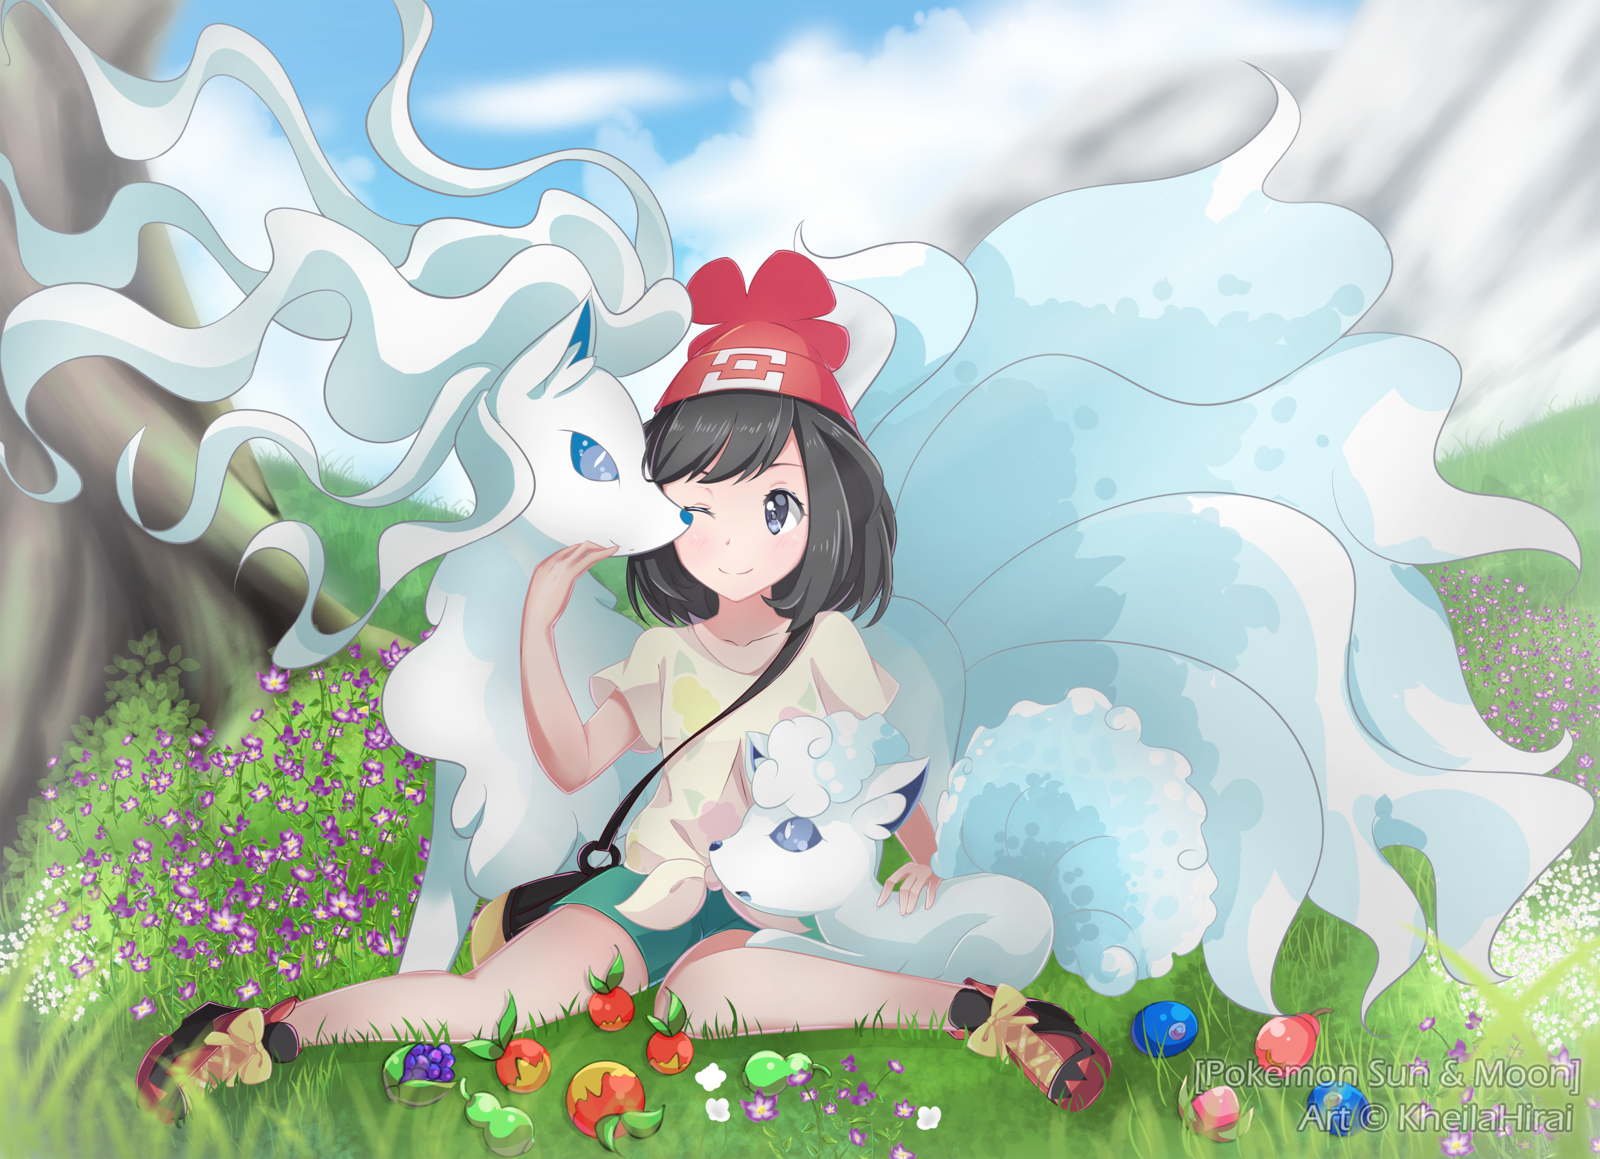 Pokemon trainer with Alola Vulpix and Ninetales + Speedpaint by KheilaHirai